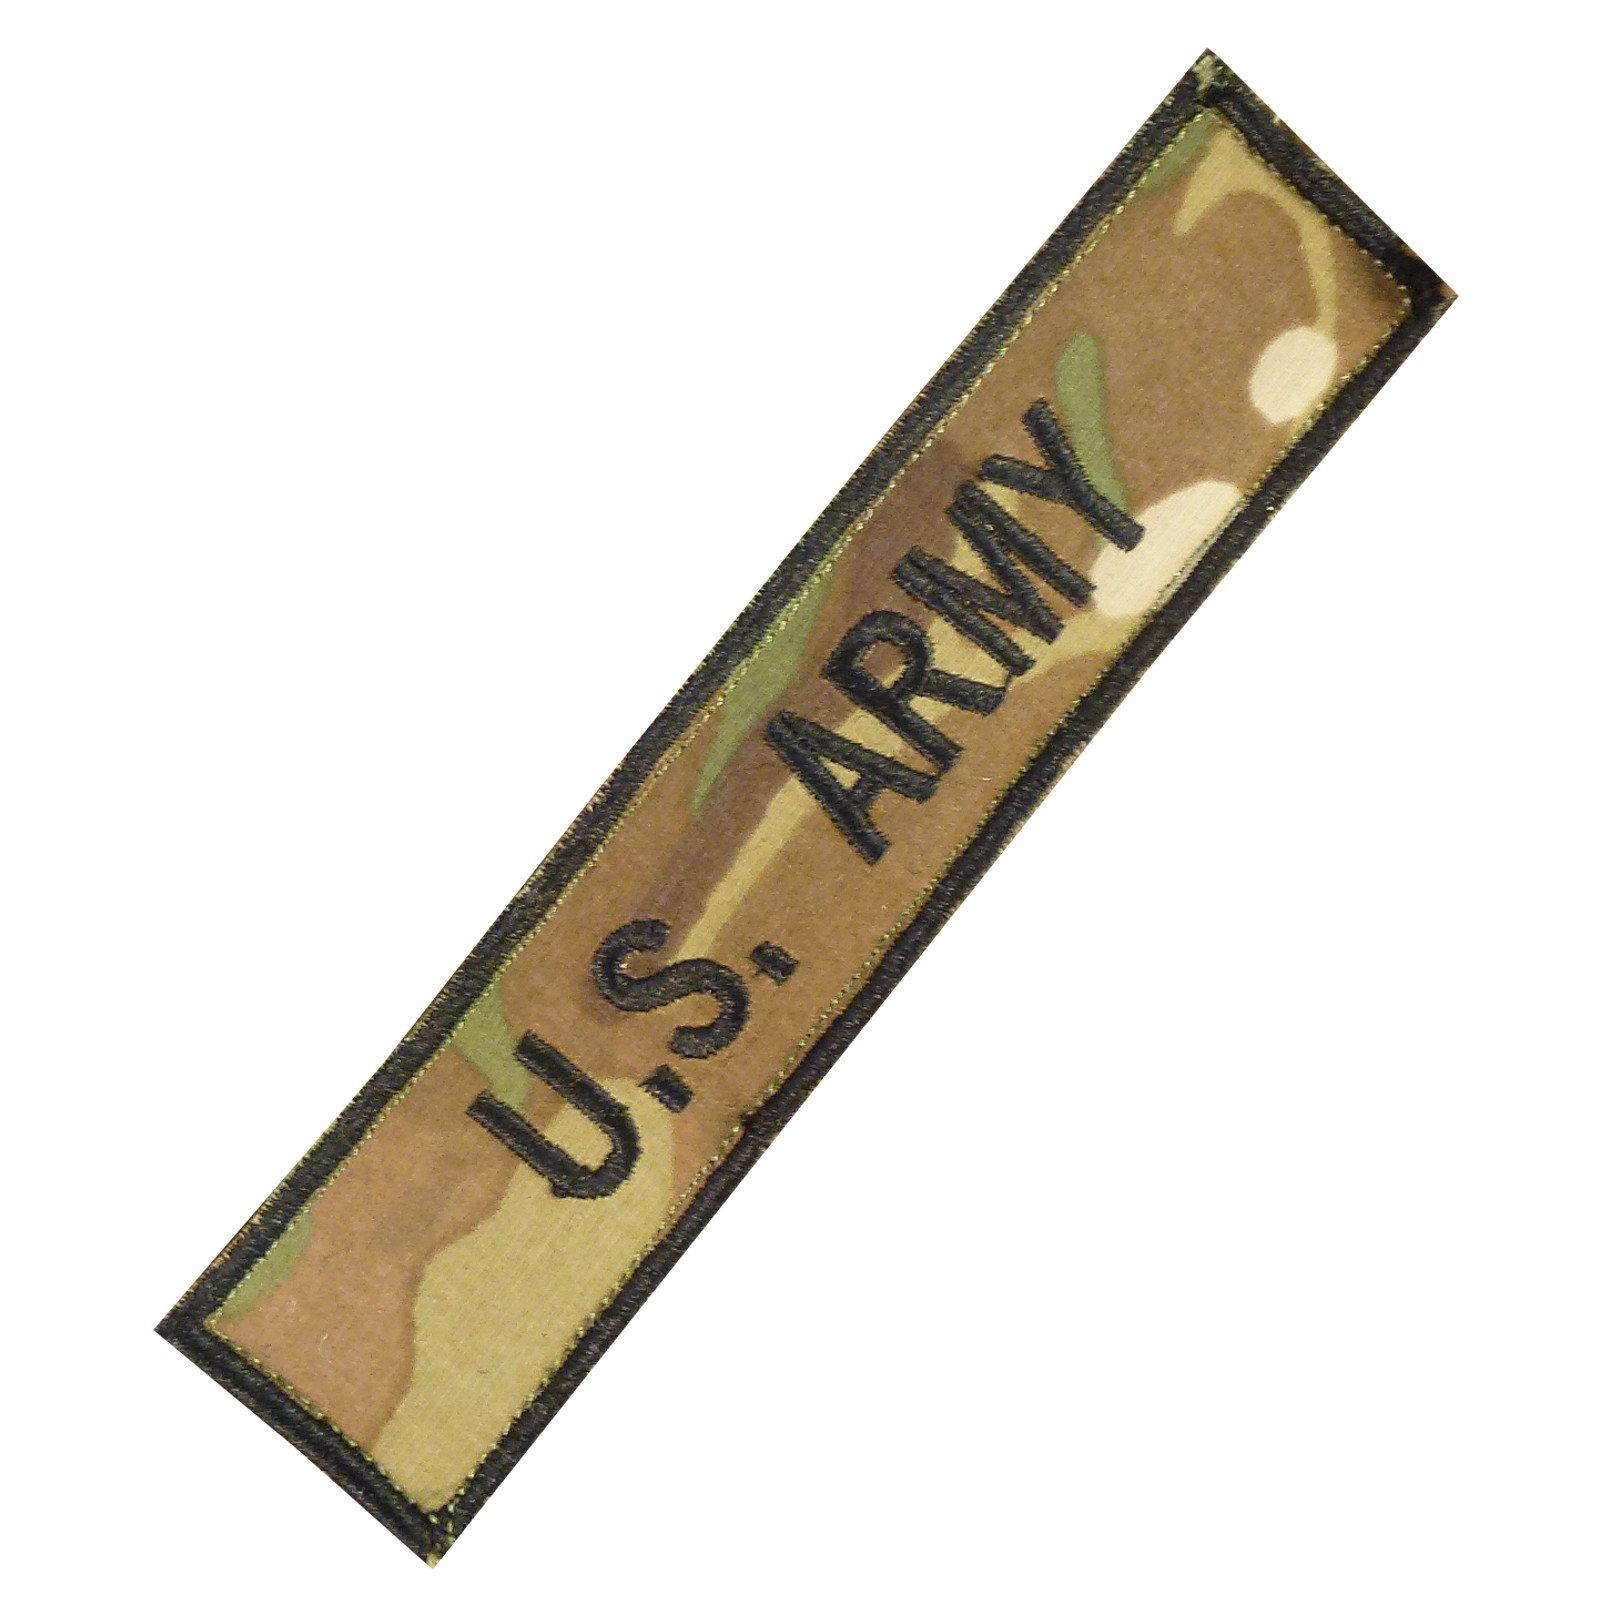 US Esercito Army Name Tape Multicam Morale Ricamata Ricamo Milspec Combat Fastener Toppa Patch